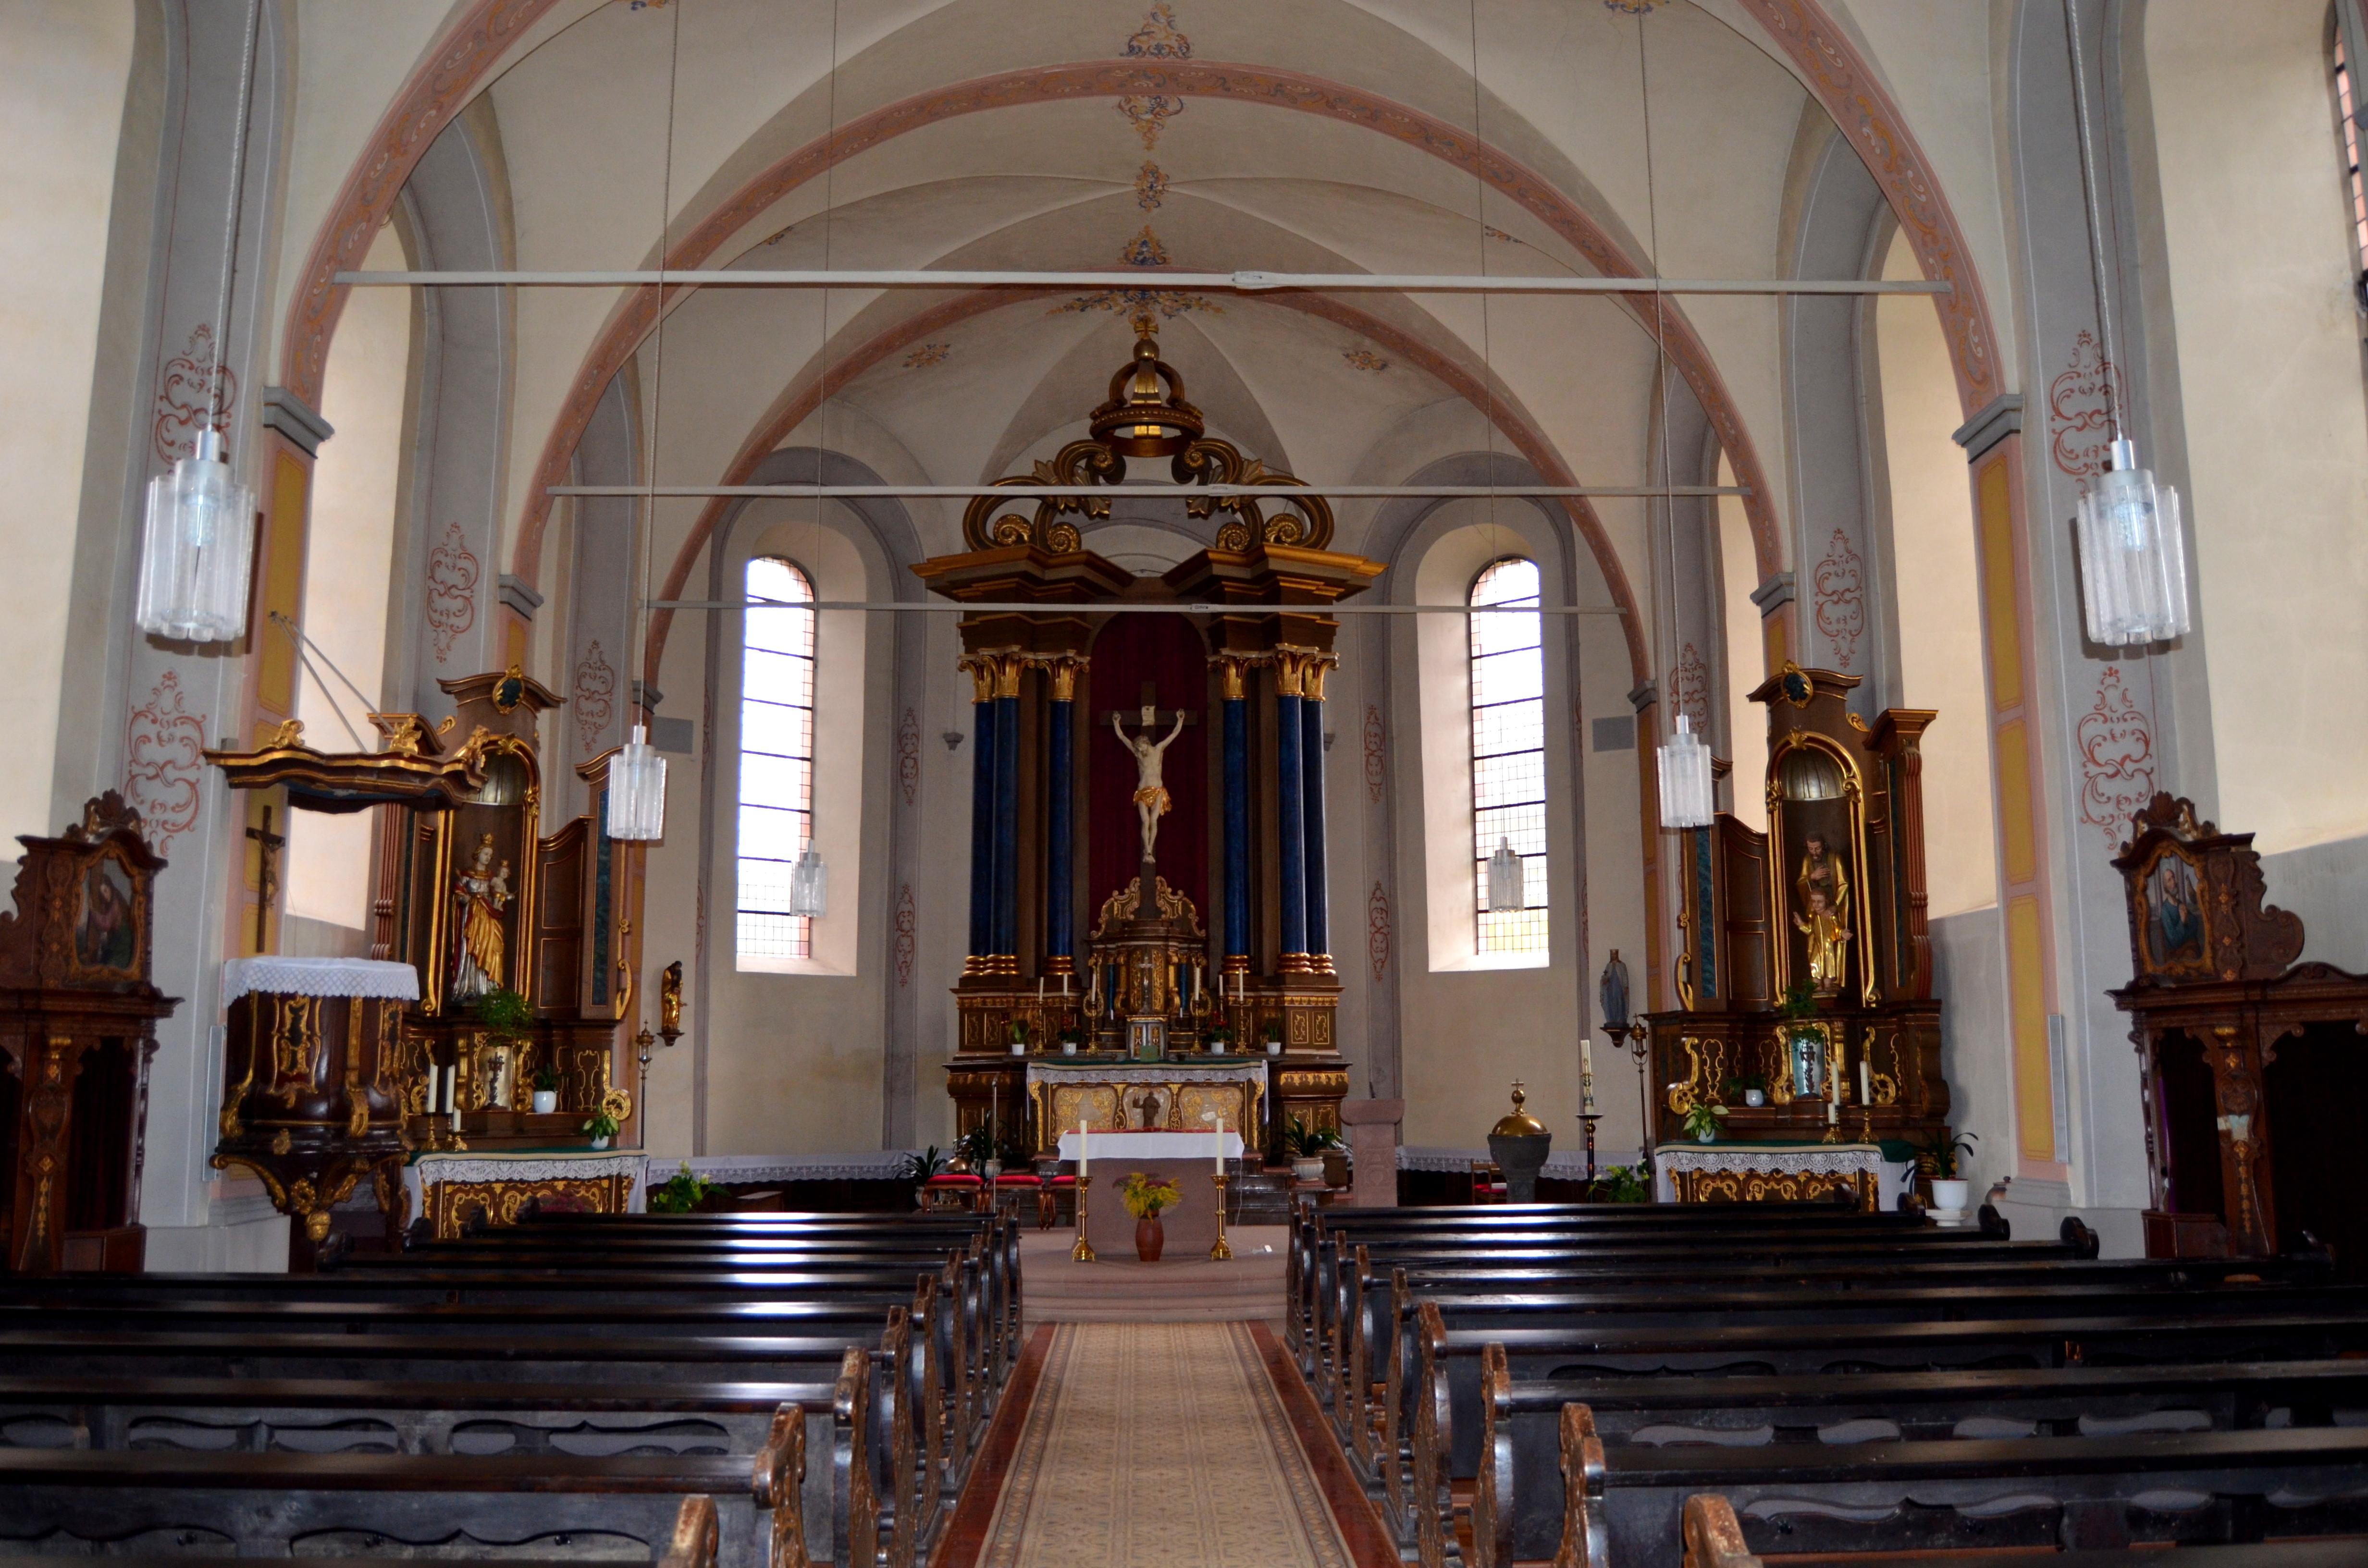 Datei:St. Castor, Mörsdorf (Hunsrück), interieur.jpg – Wikipedia